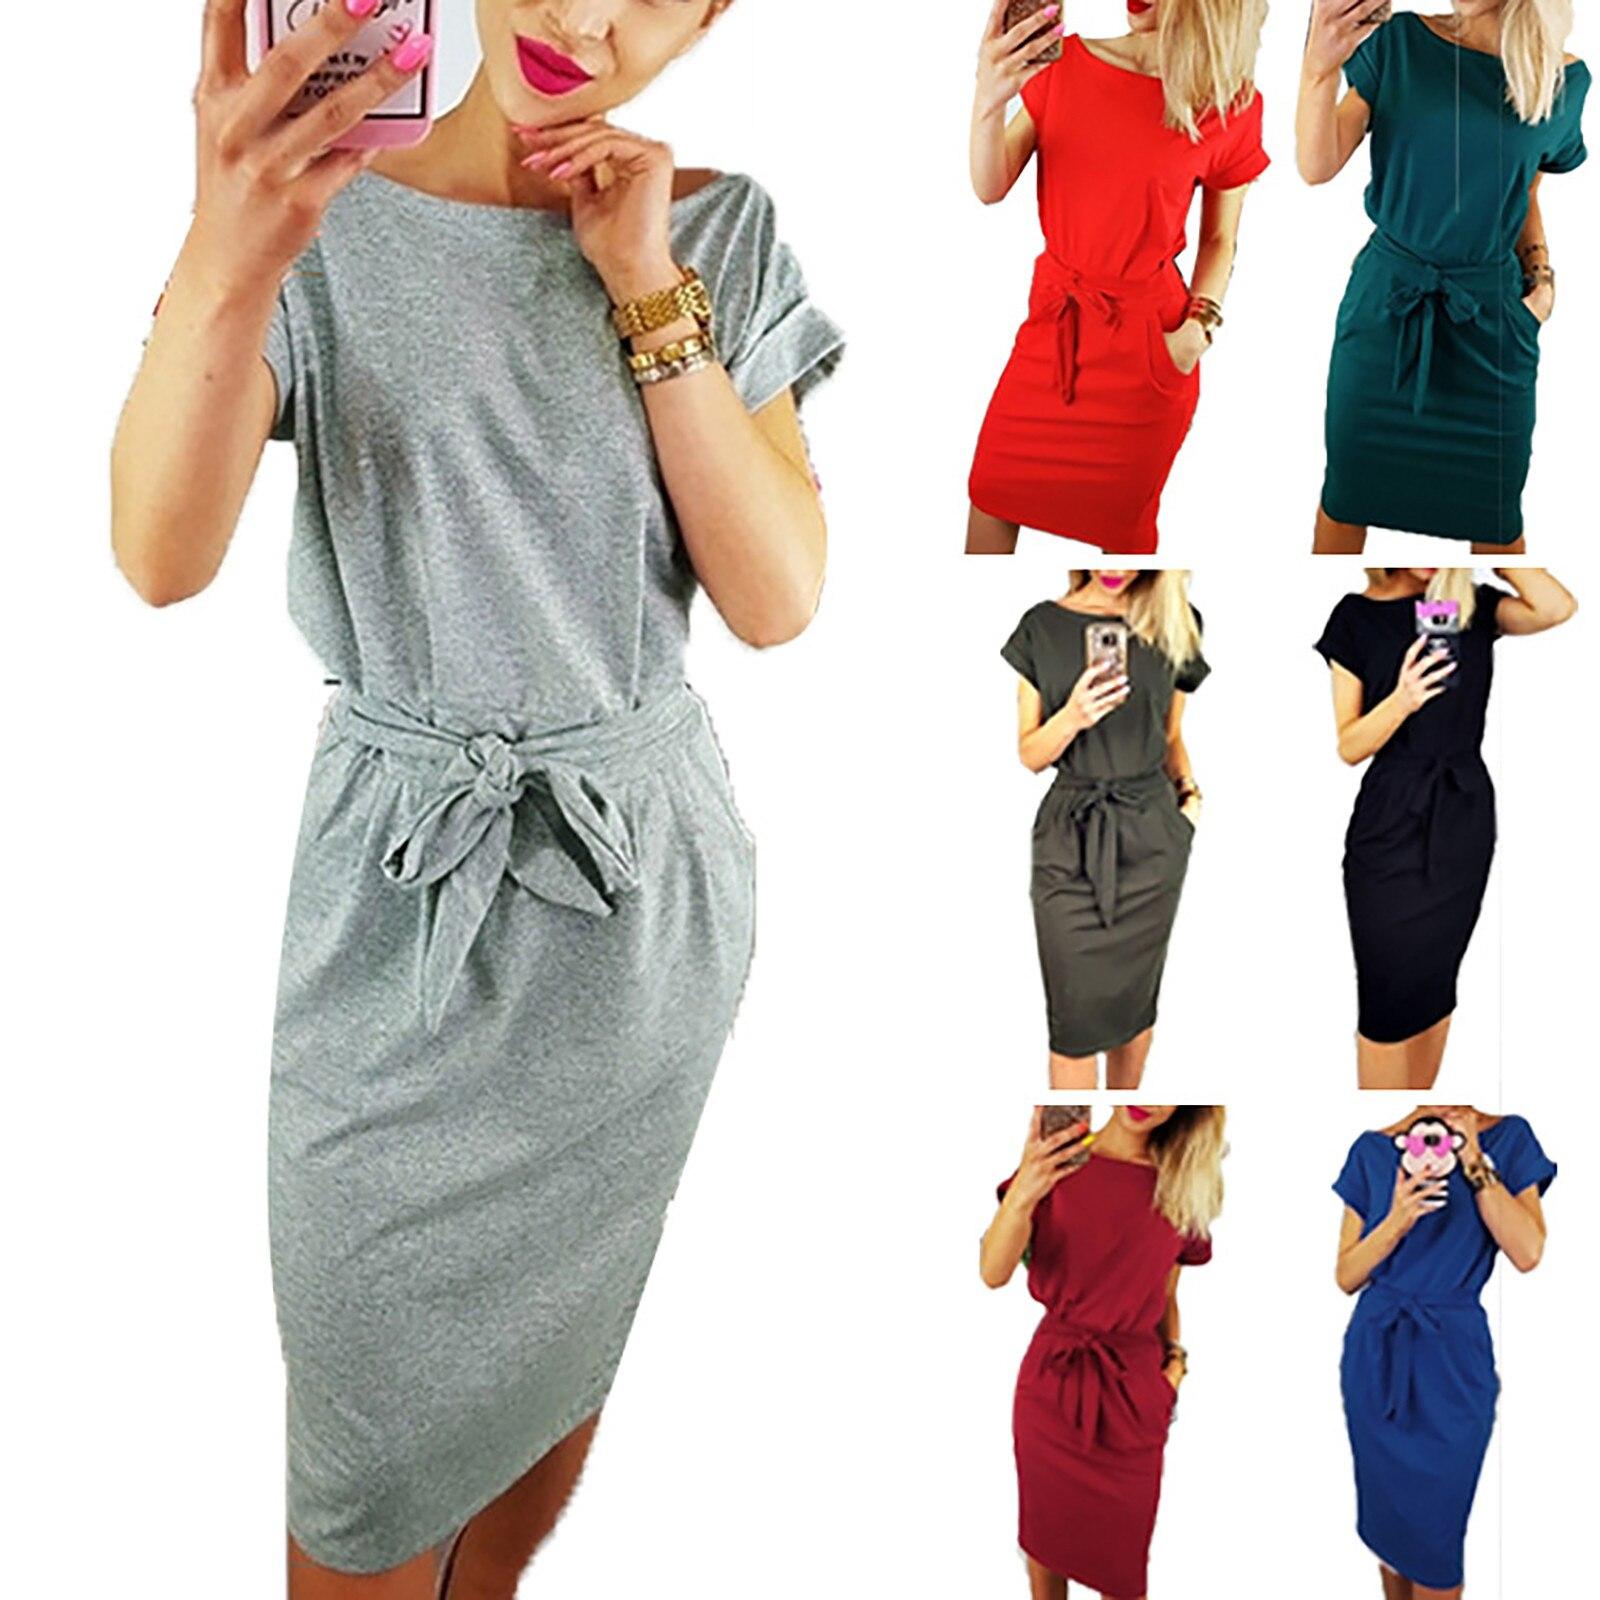 Casual Comfortable Dress Womens Casual Pocket Summer Ladies Short Sleeve Evening Party Dress Платья Для Женщин